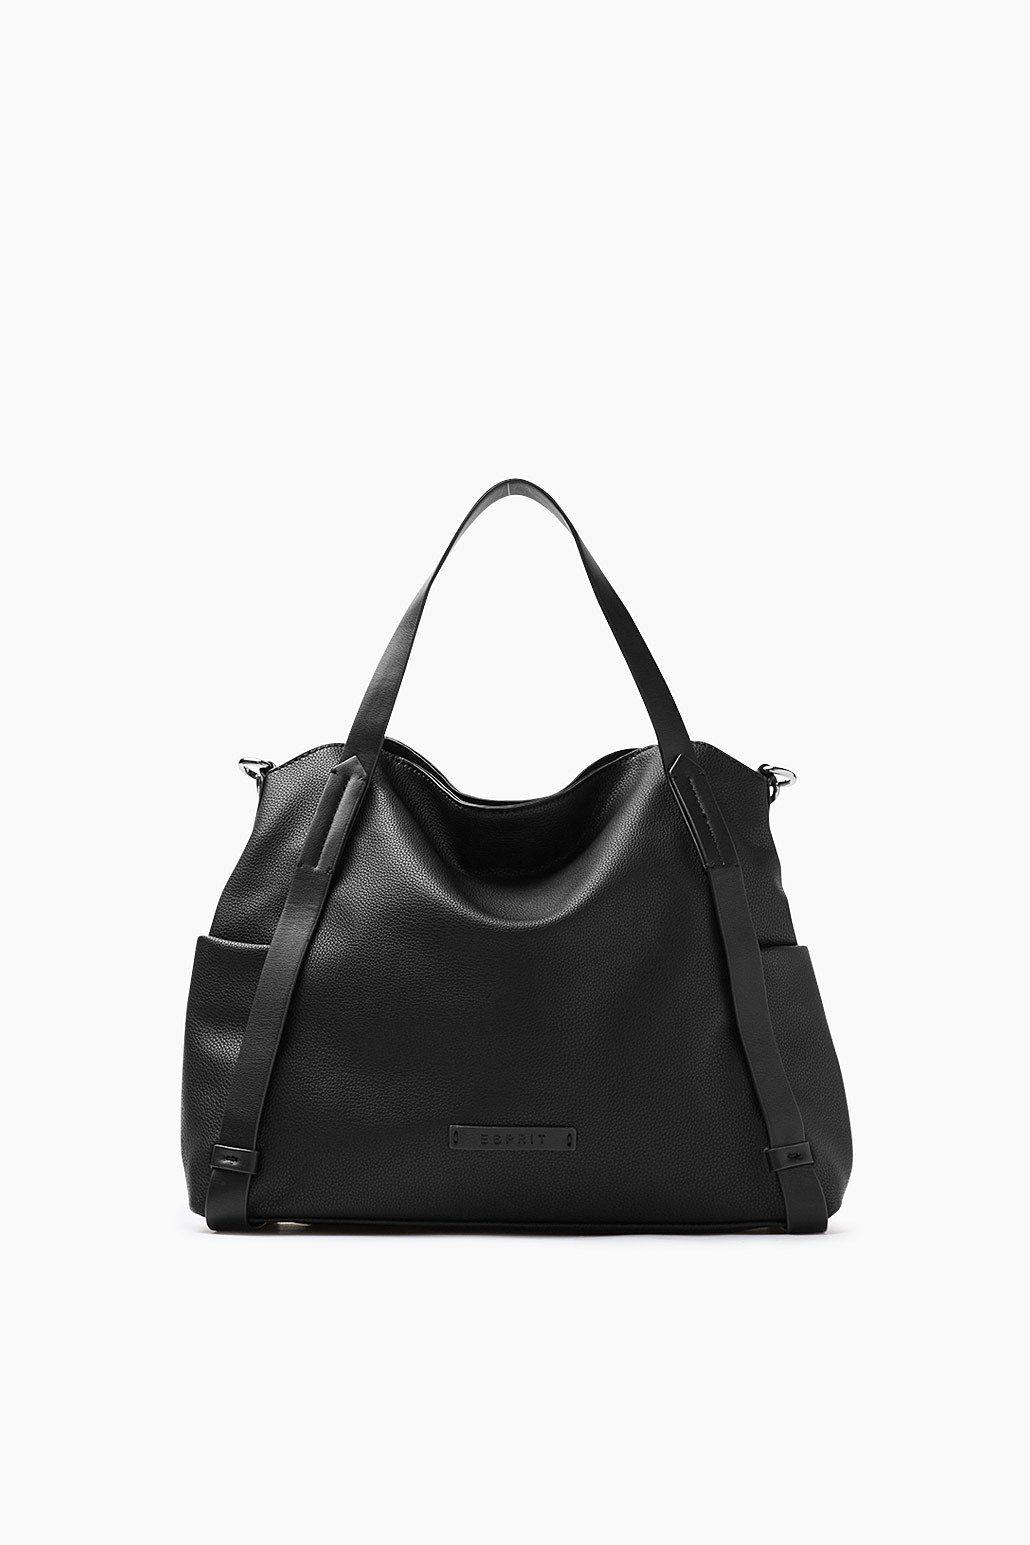 ESPRIT CASUAL Softe City Bag in Lederoptik